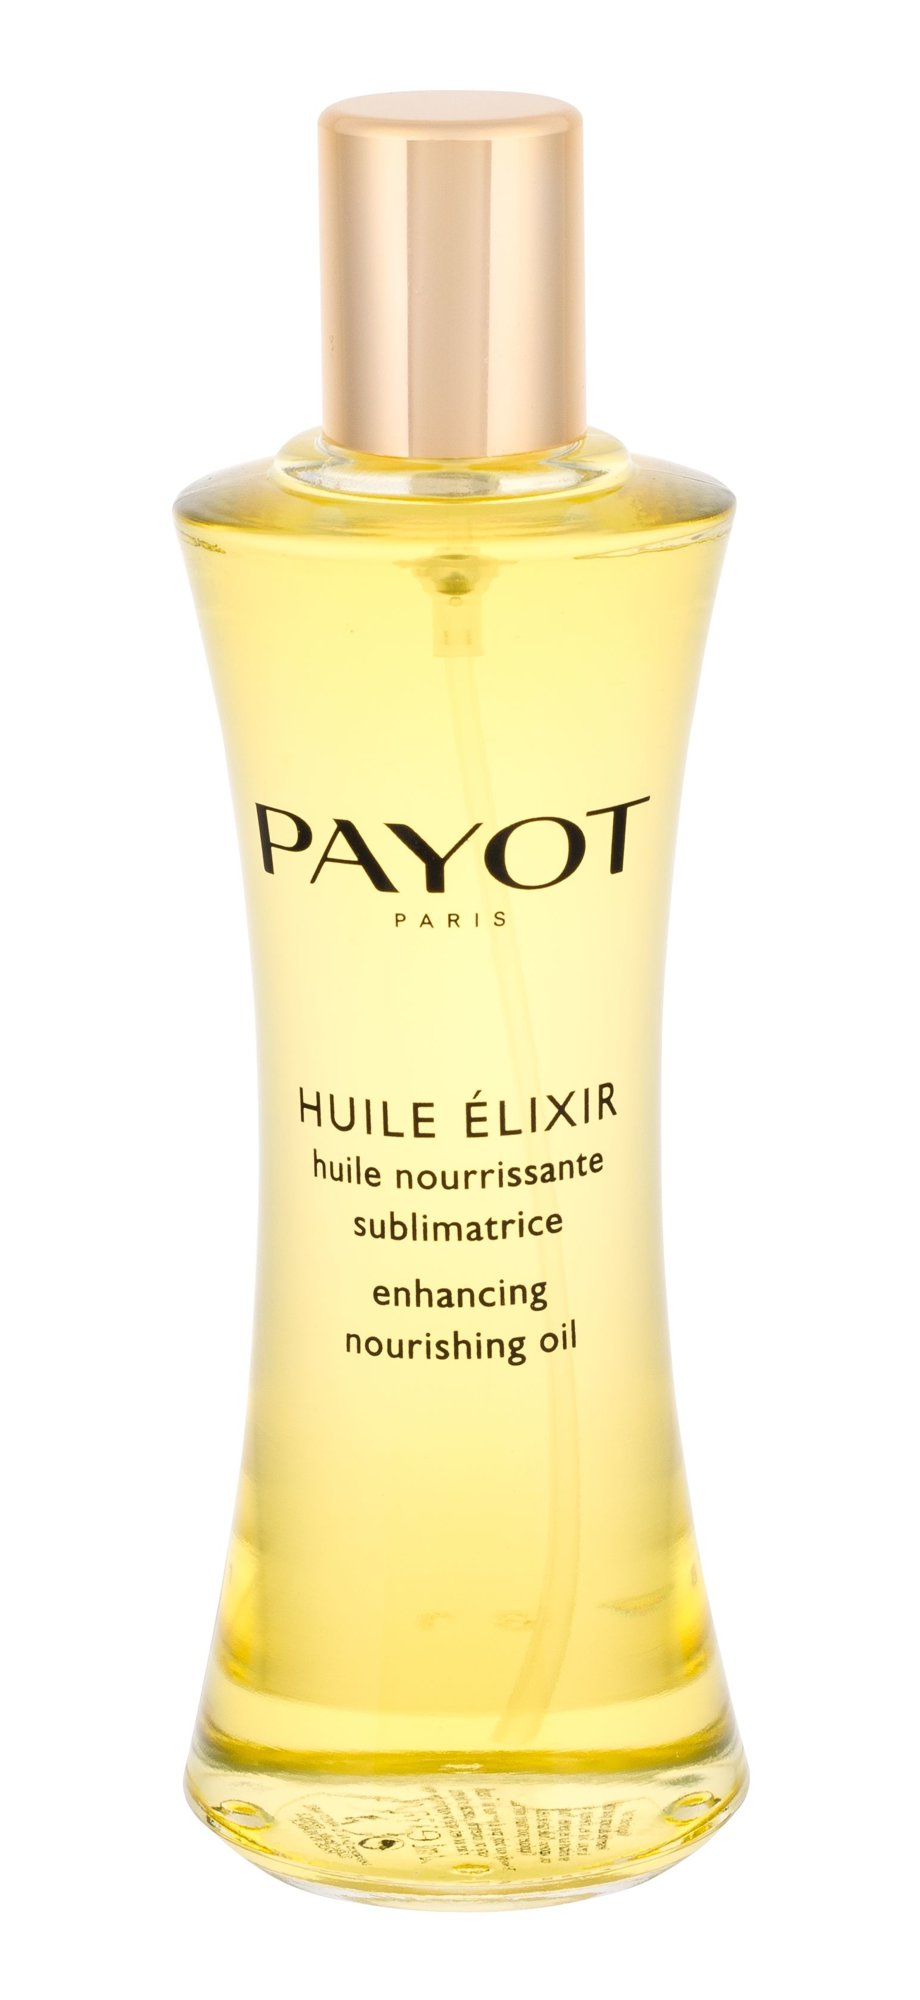 PAYOT Body Élixir Cosmetic 100ml  Enhancing Nourishing Oil